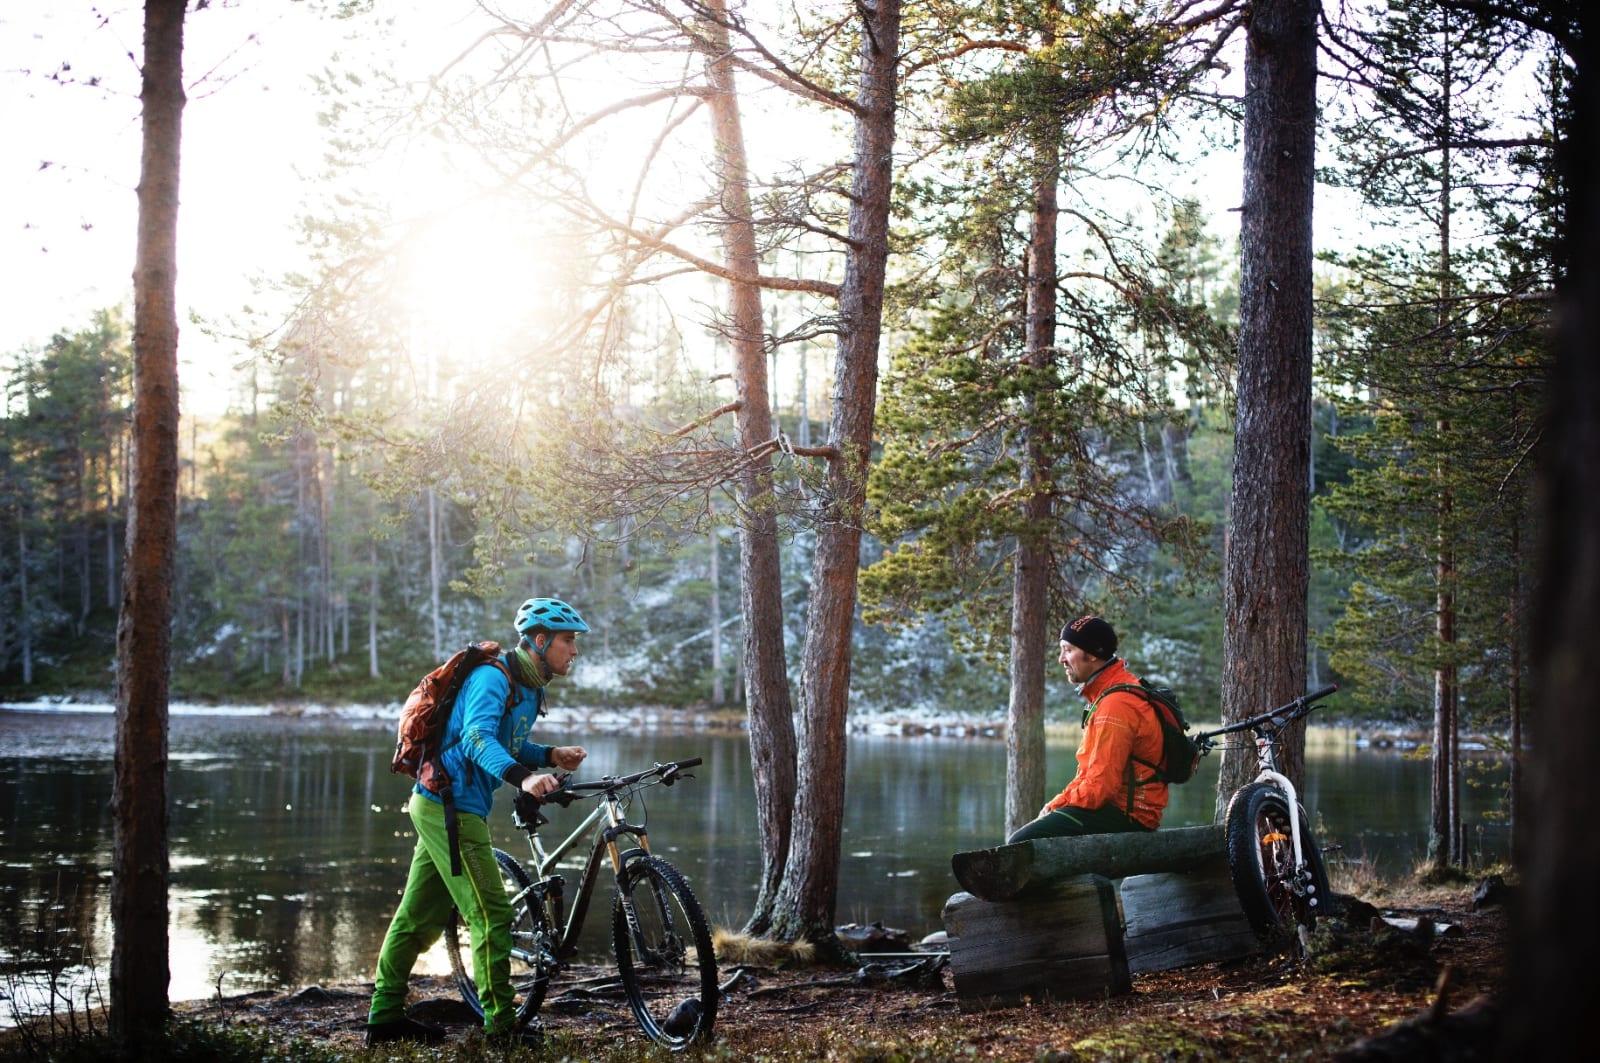 EN PAUSE VED VANNET: Ved vannkanten i Mølmannsdalen tar vi en pause før siste stiparti.